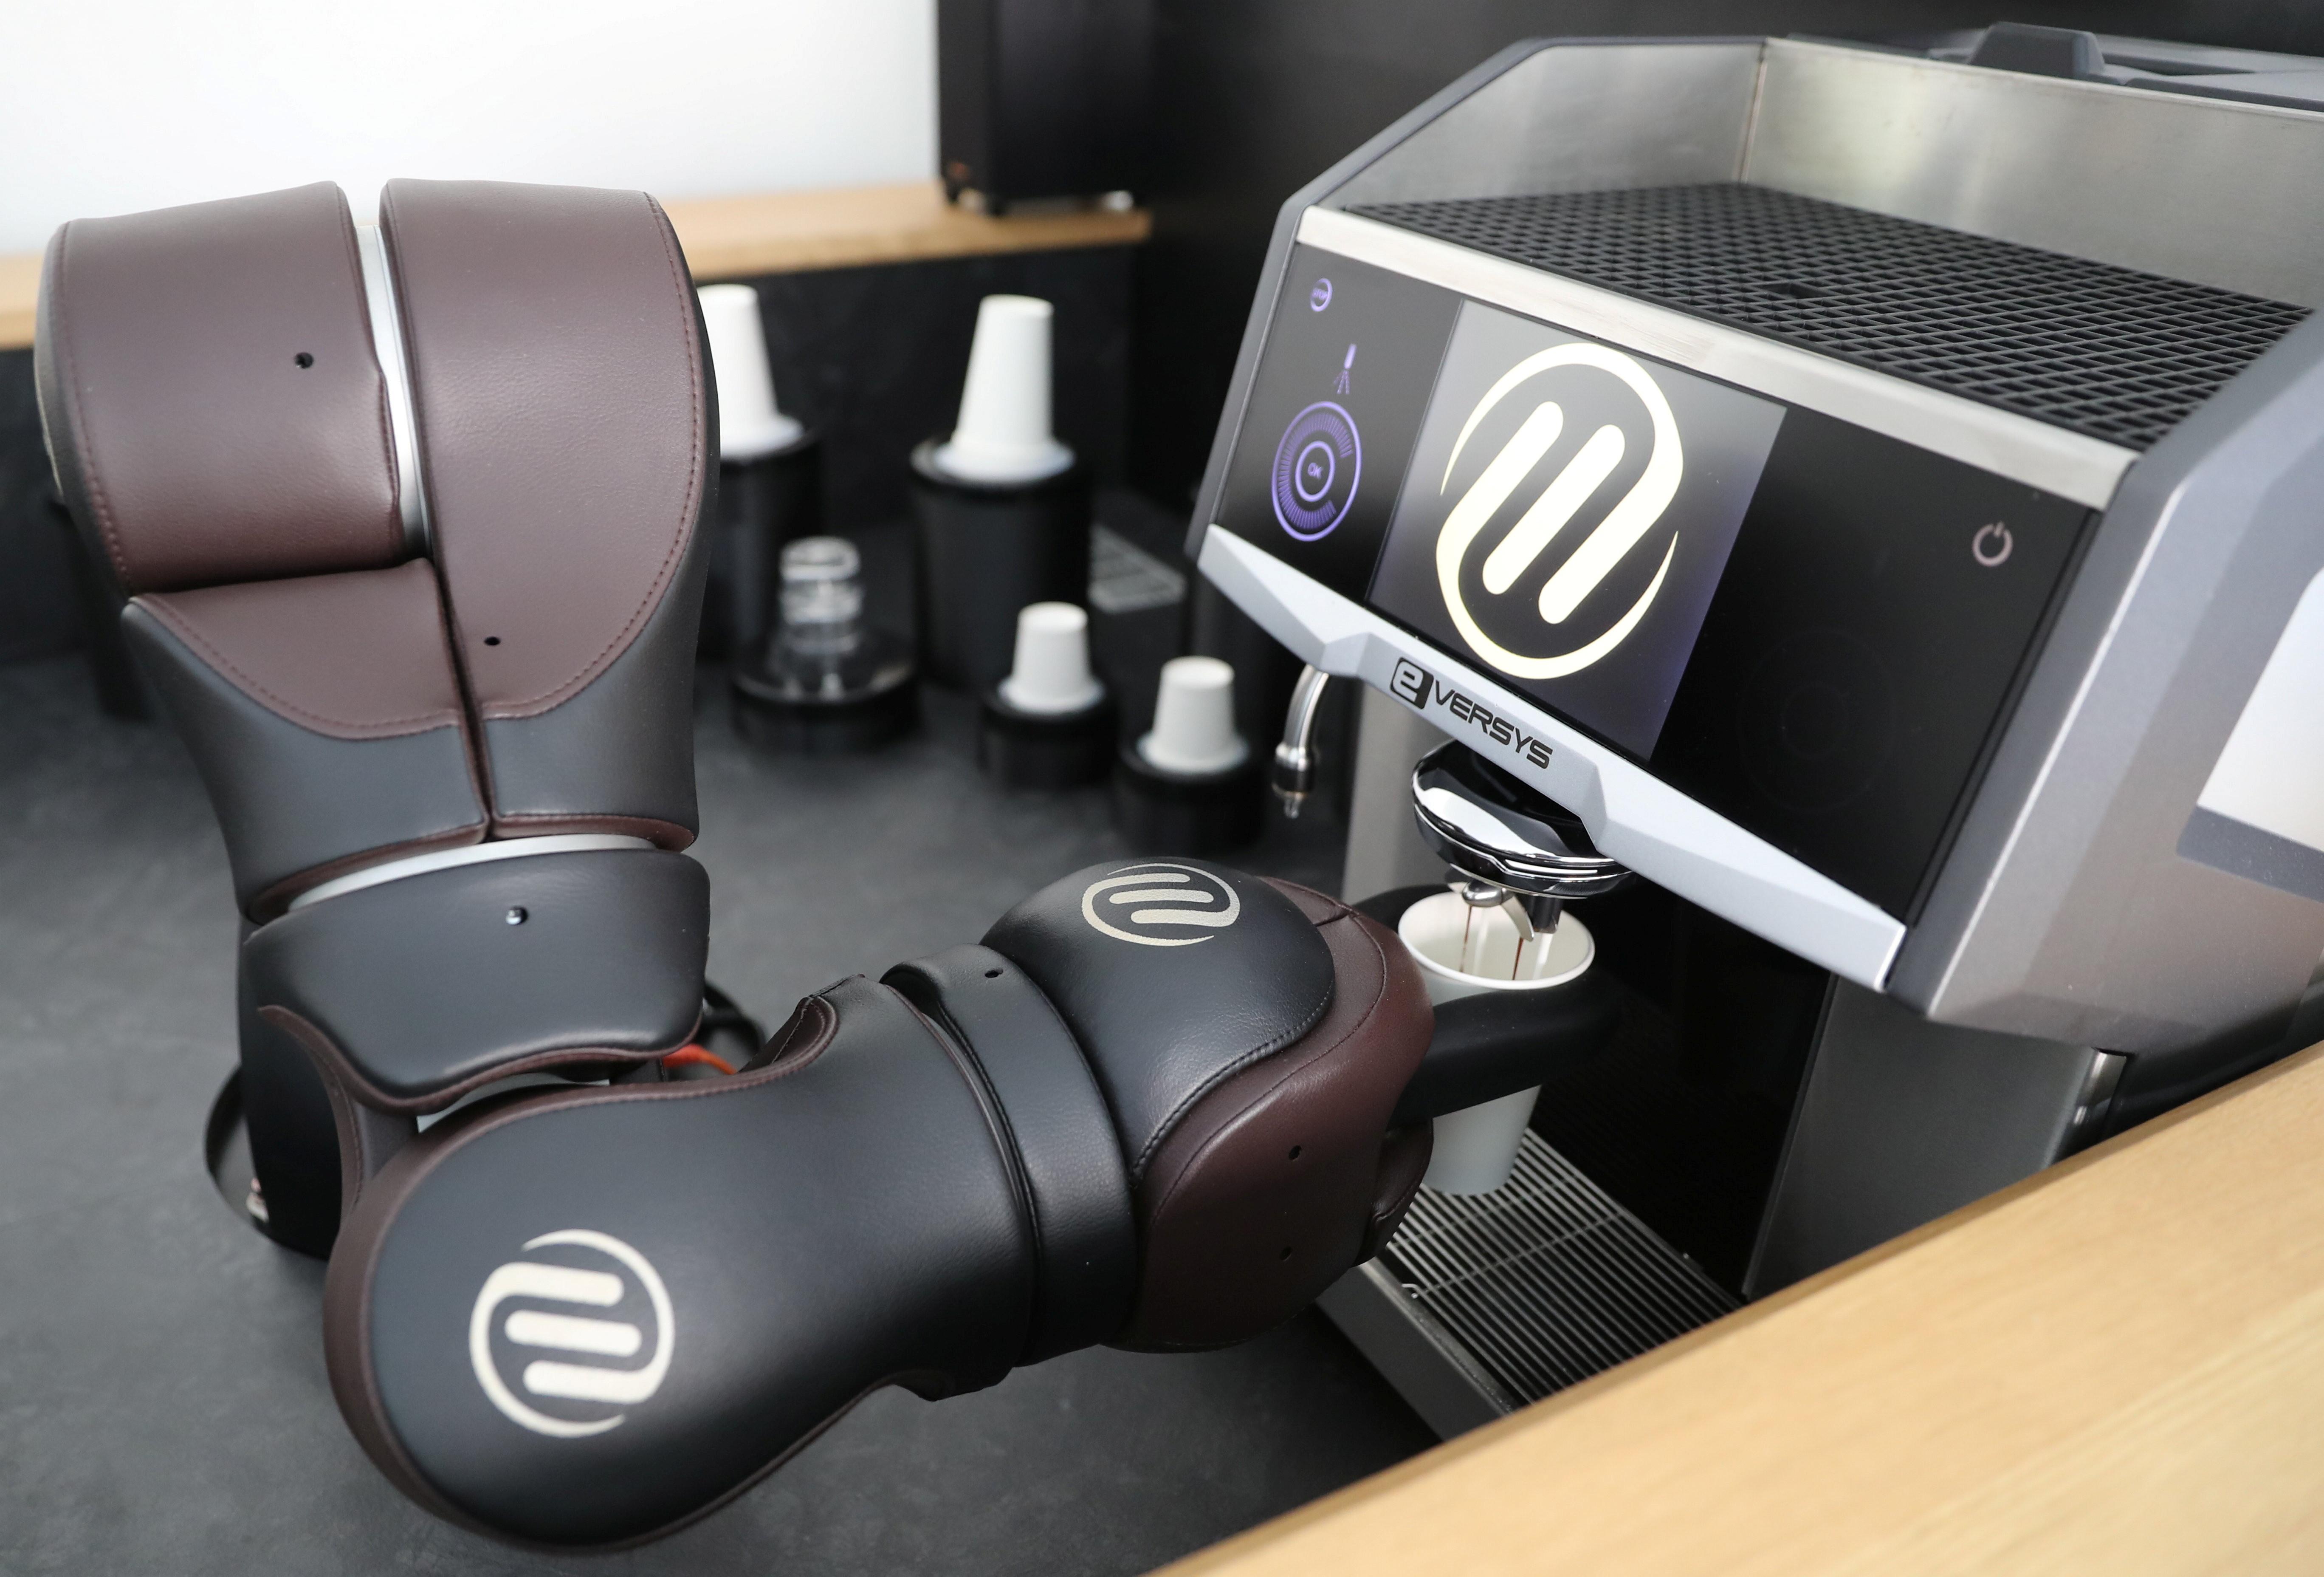 A robotic arm prepares a cappuccino at the Barney Barista Bar of the Swiss F&P Robotics company in Zurich, Switzerland